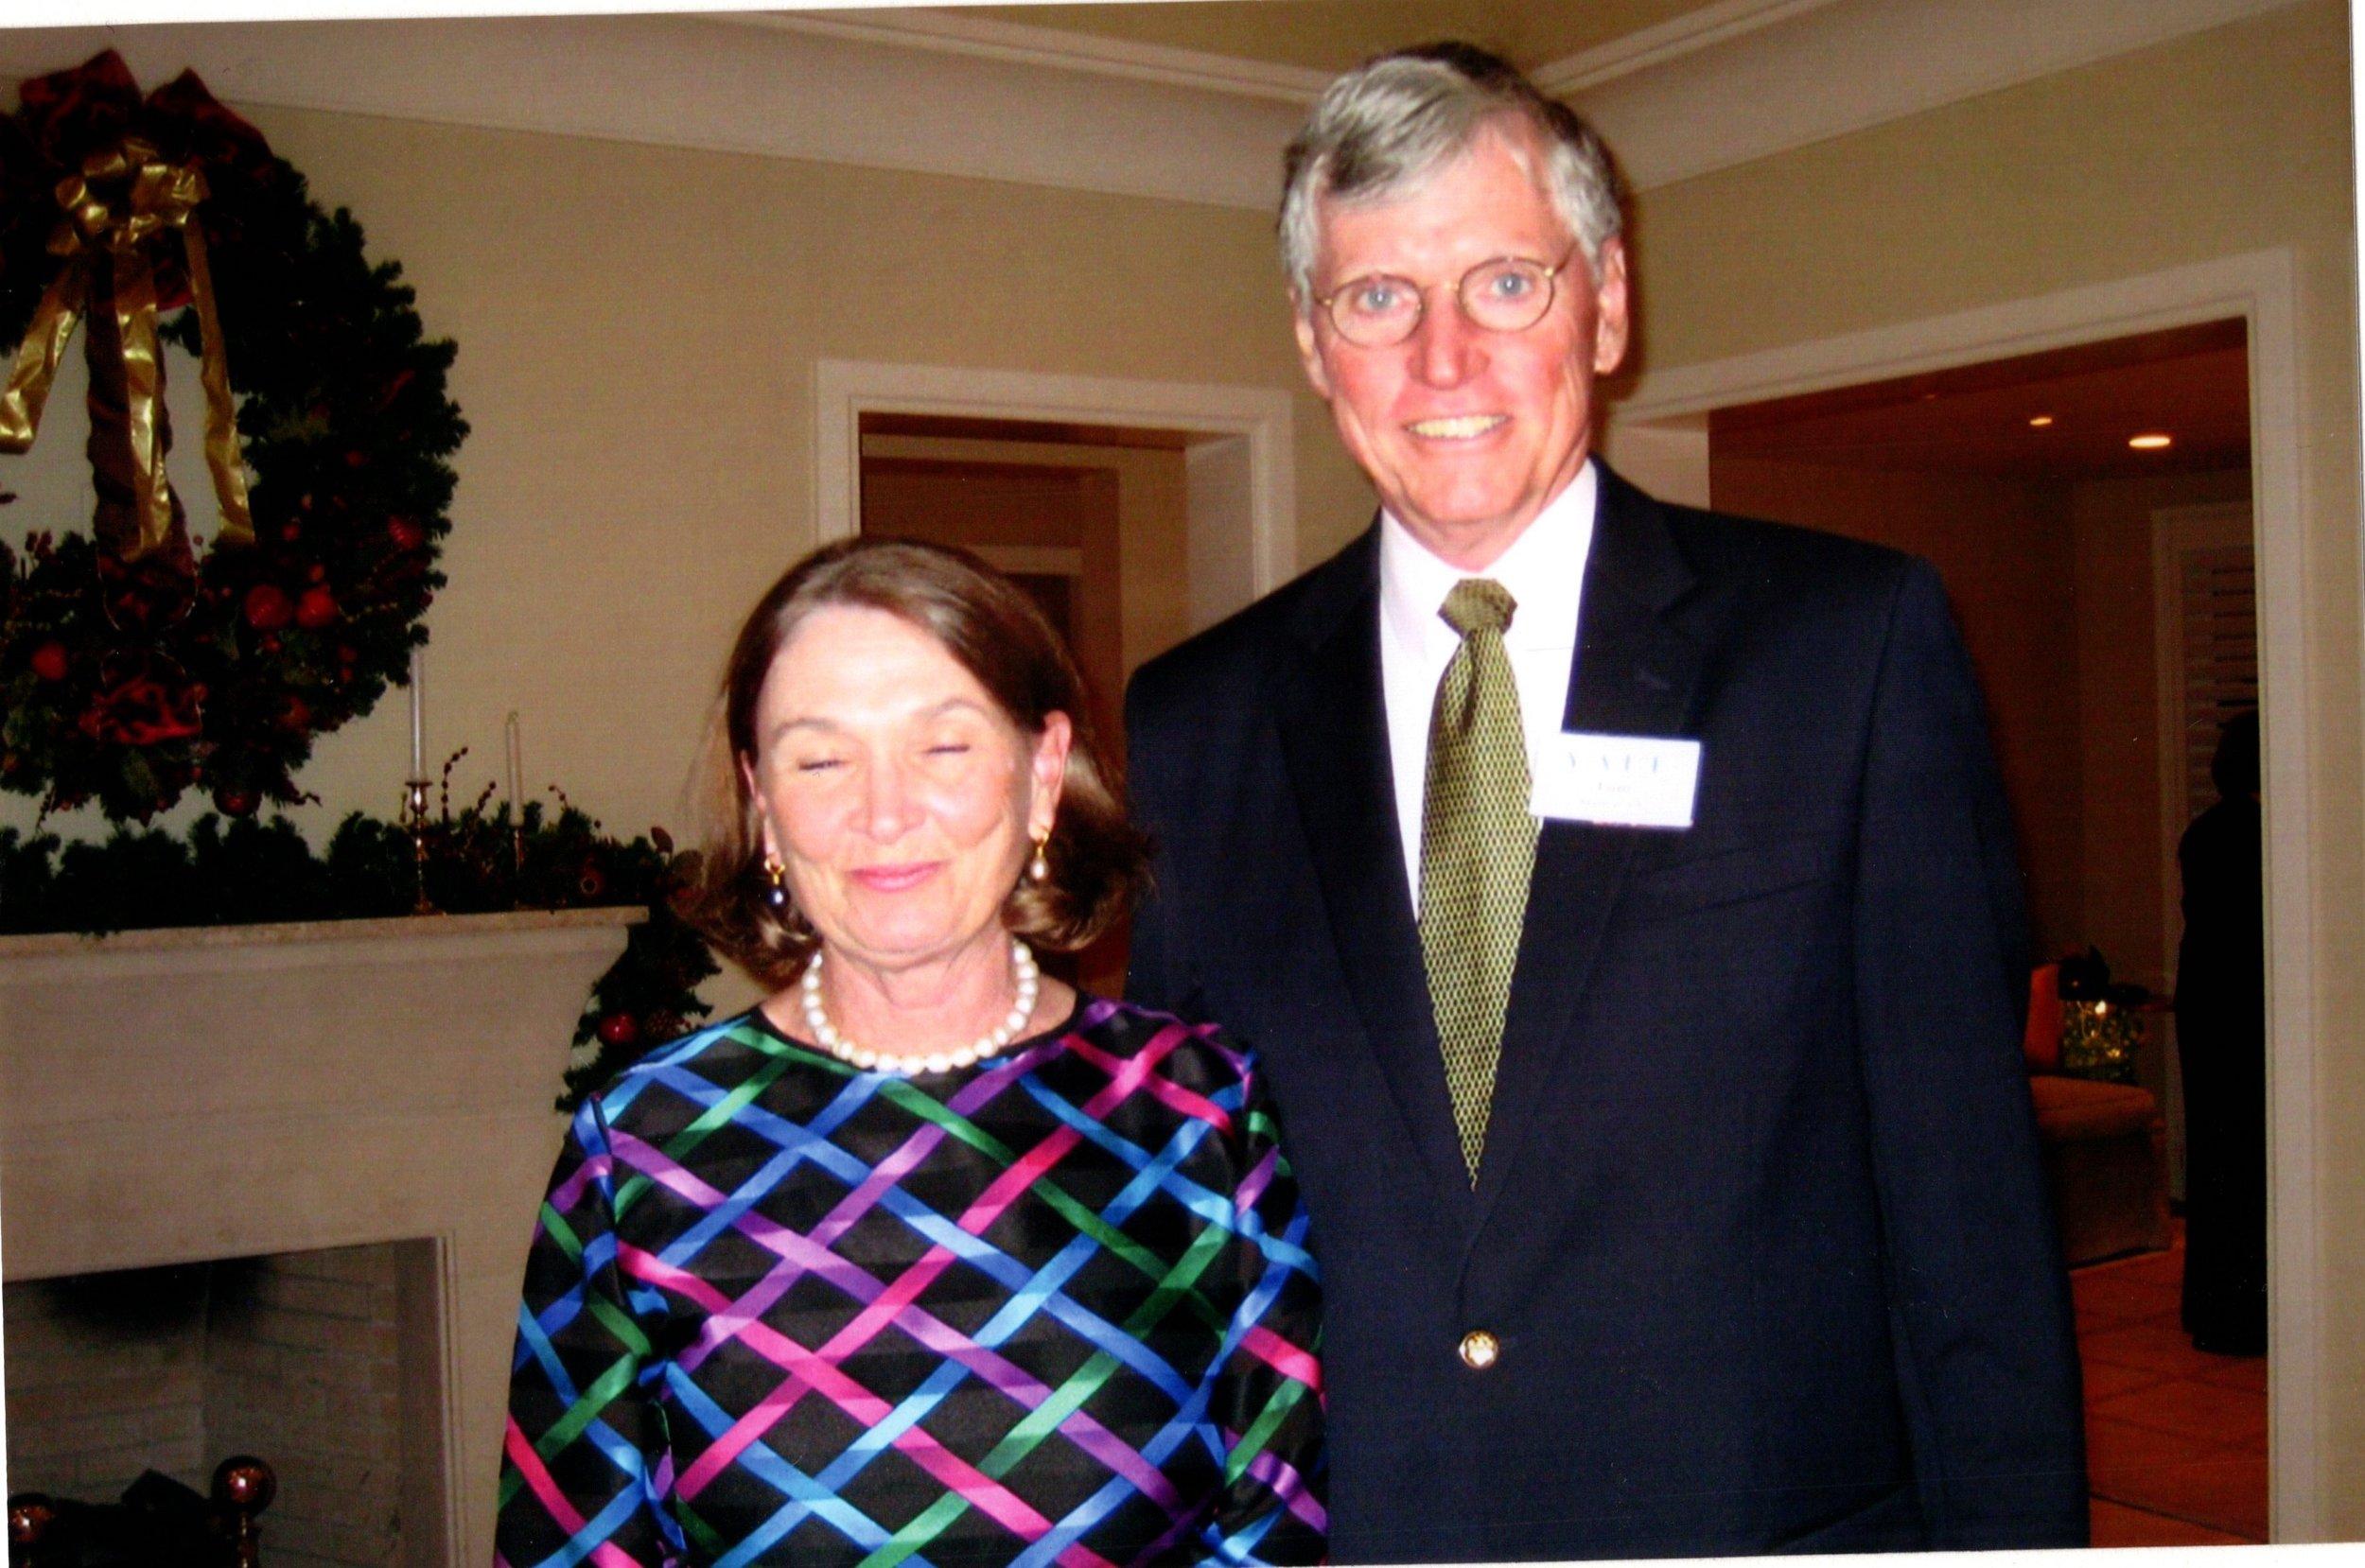 12_11_2008 - HOLIDAY PARTY - TOM WHEELER'S HOME 36.jpg